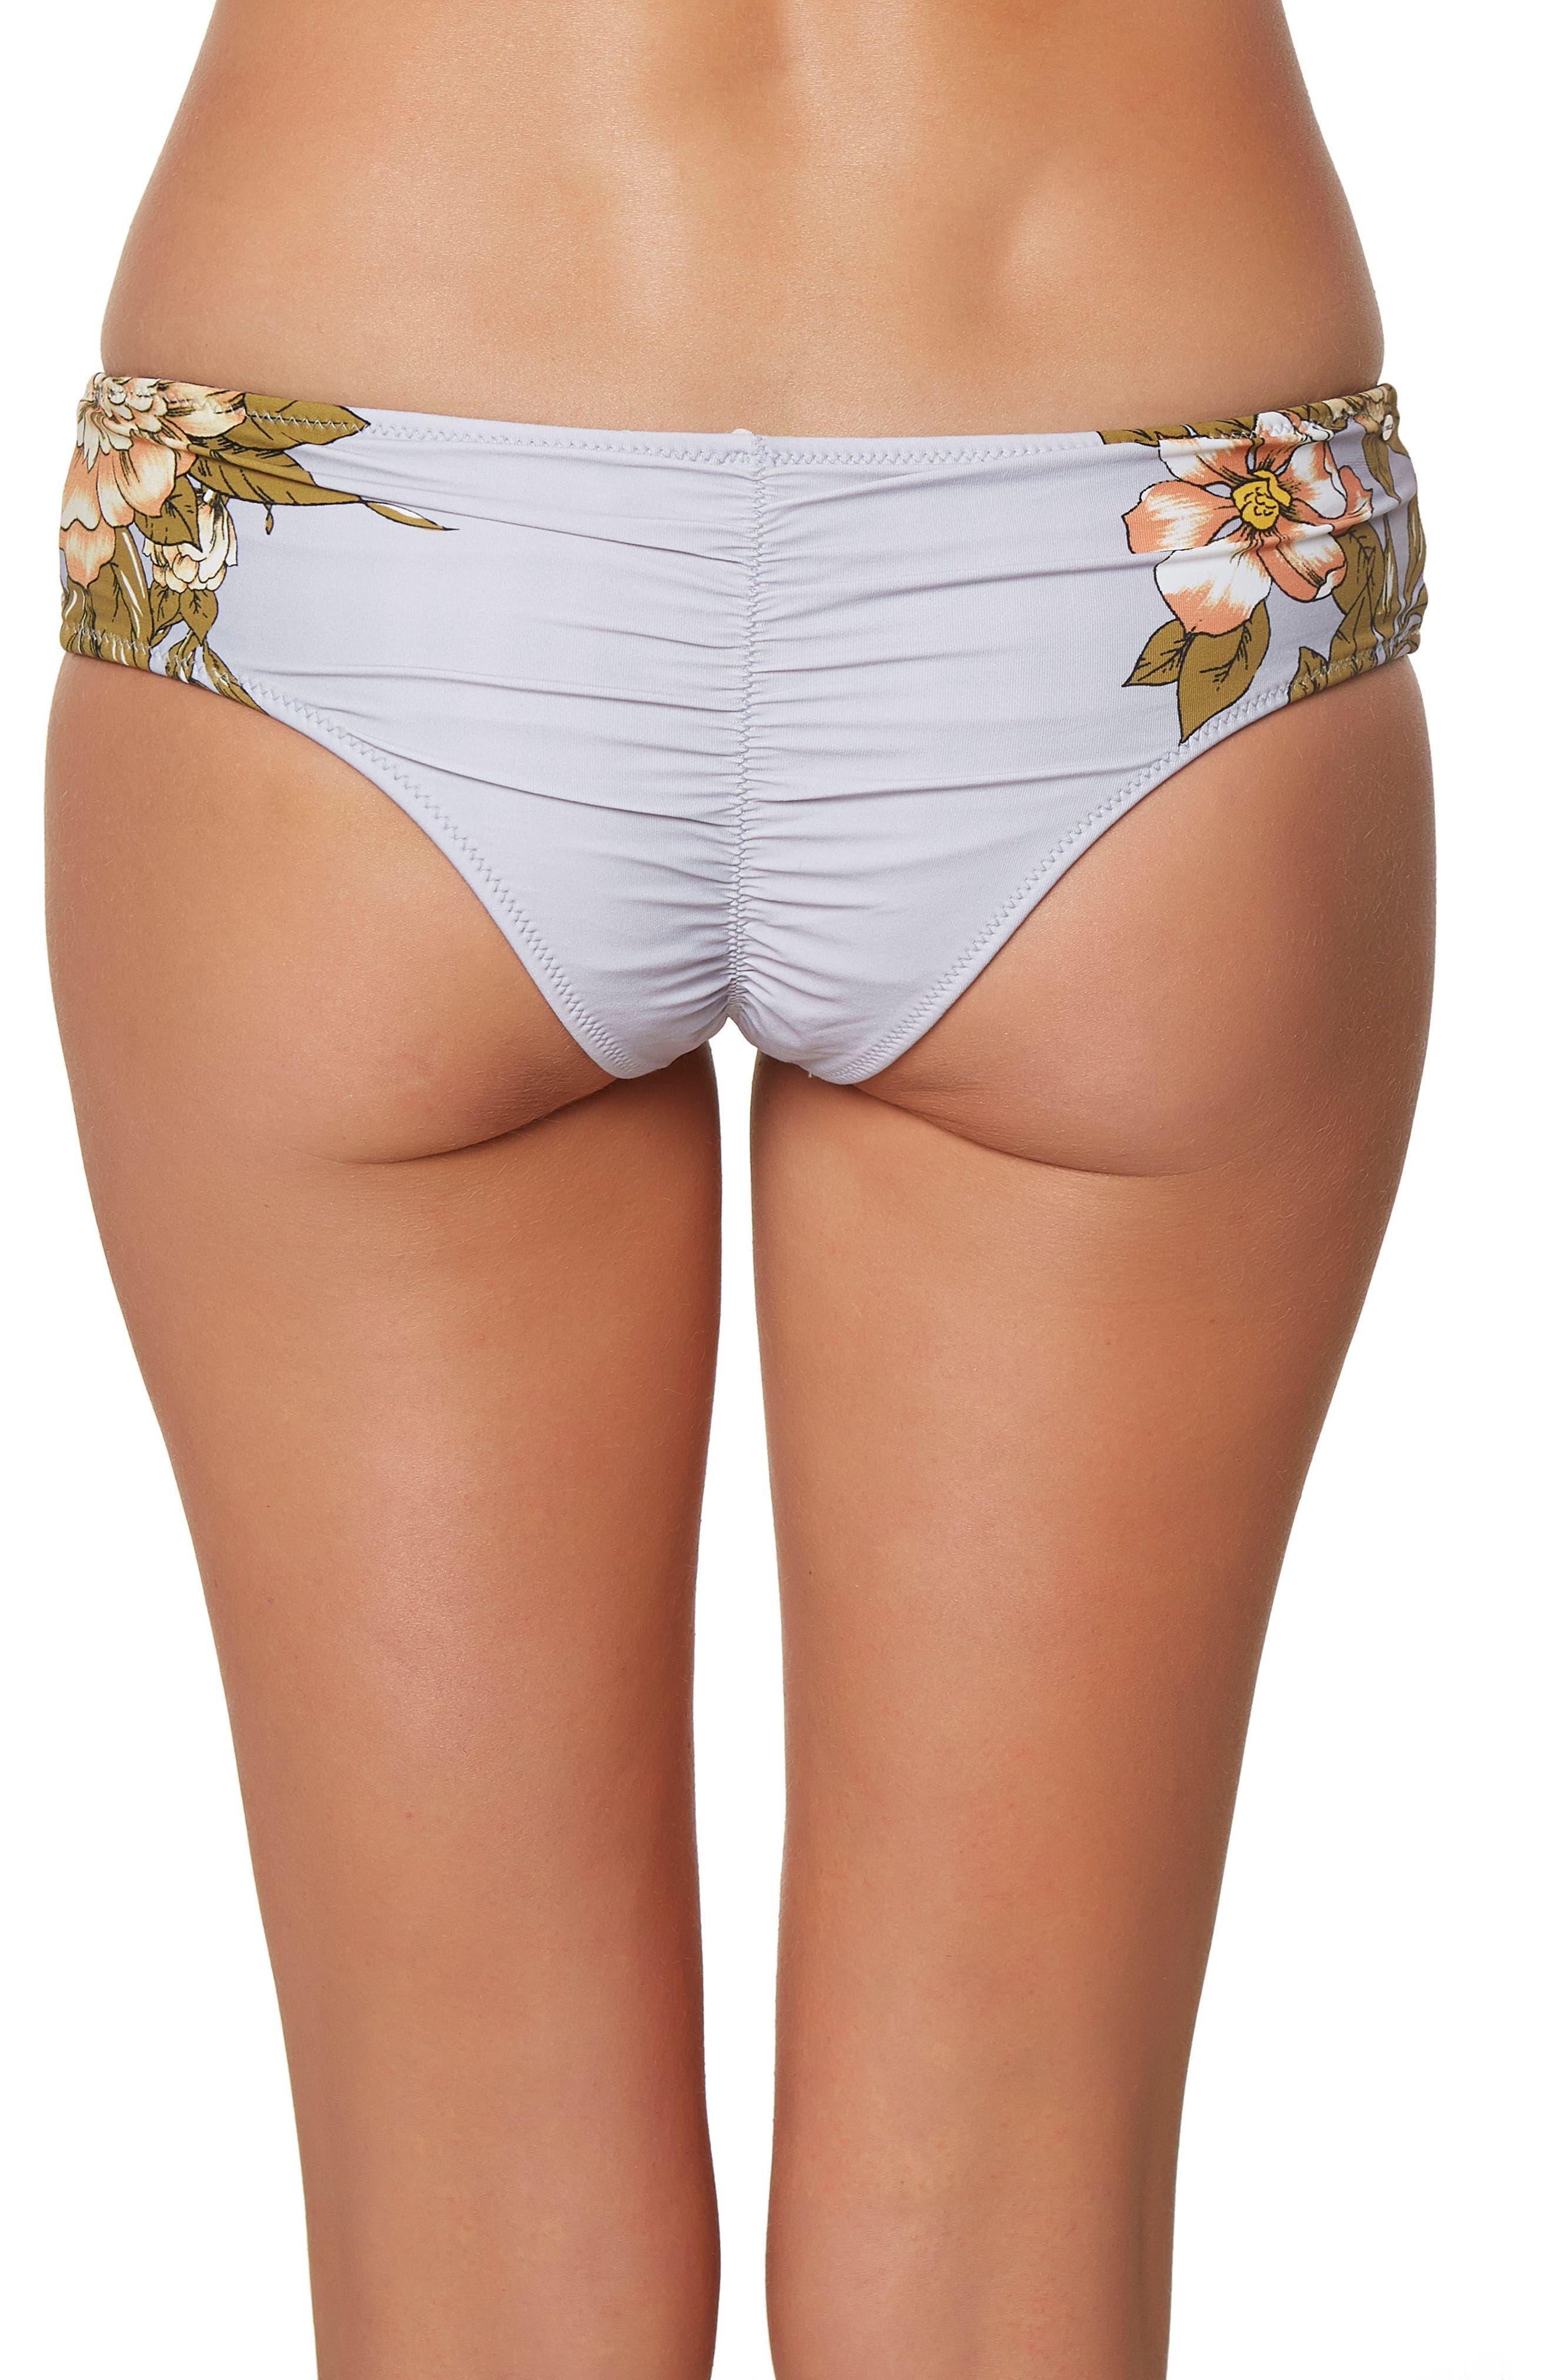 Alternate Image 2  - O'Neill Aloha Floral Revo Hipster Bikini Bottoms